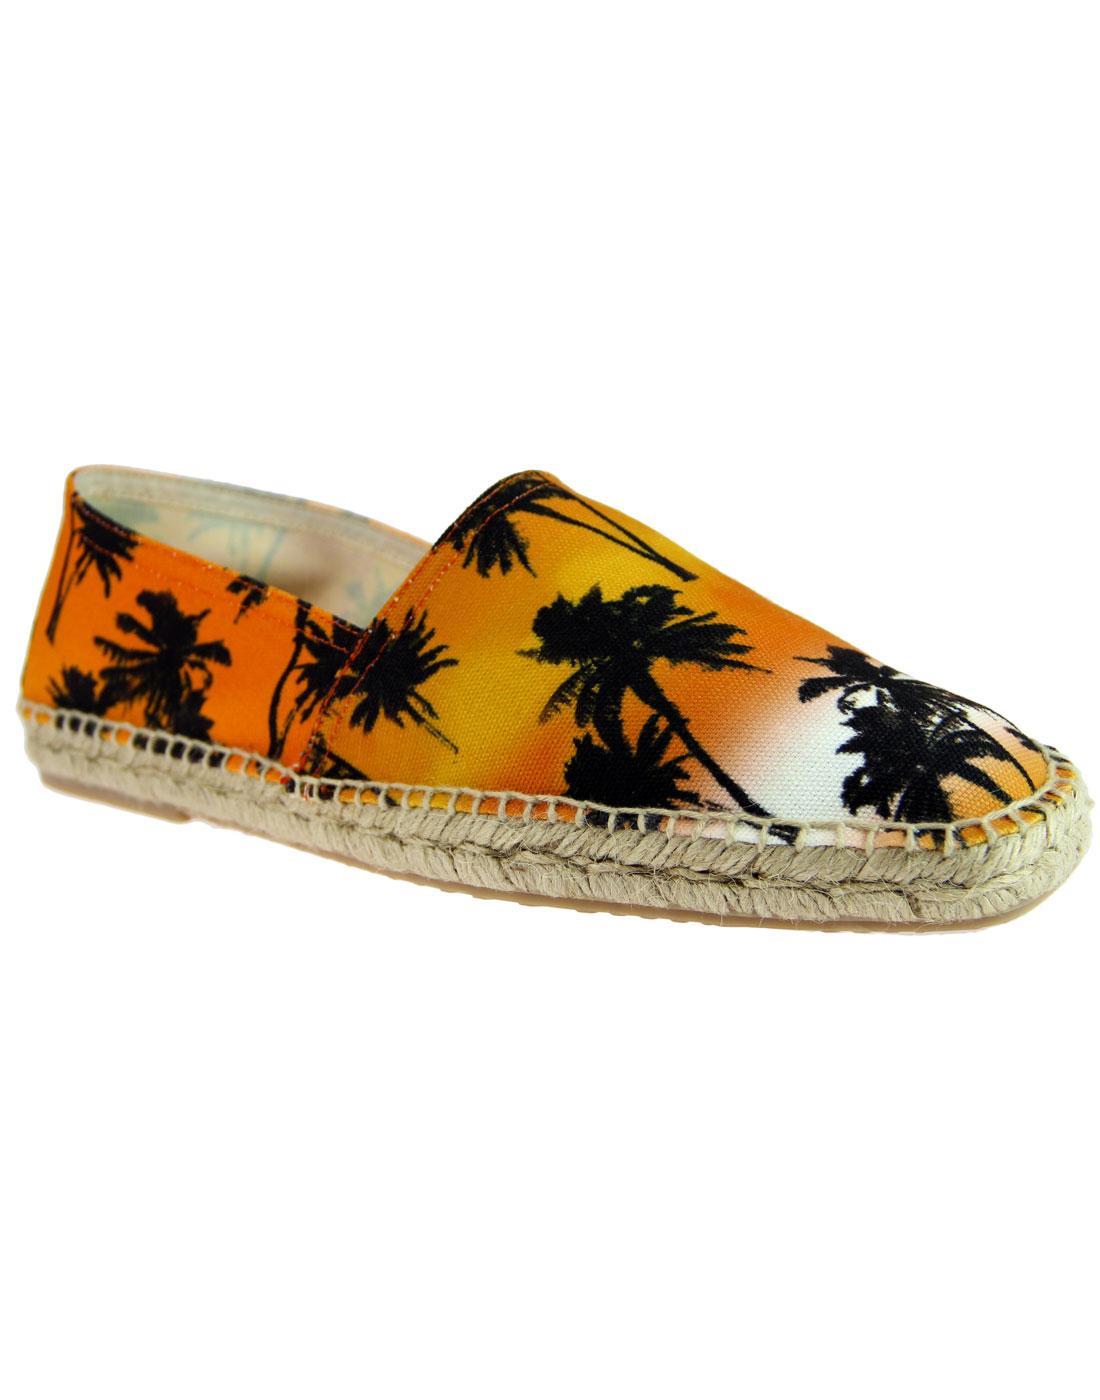 Blake HUDSON Retro Hawaiian Palm Print Espadrilles